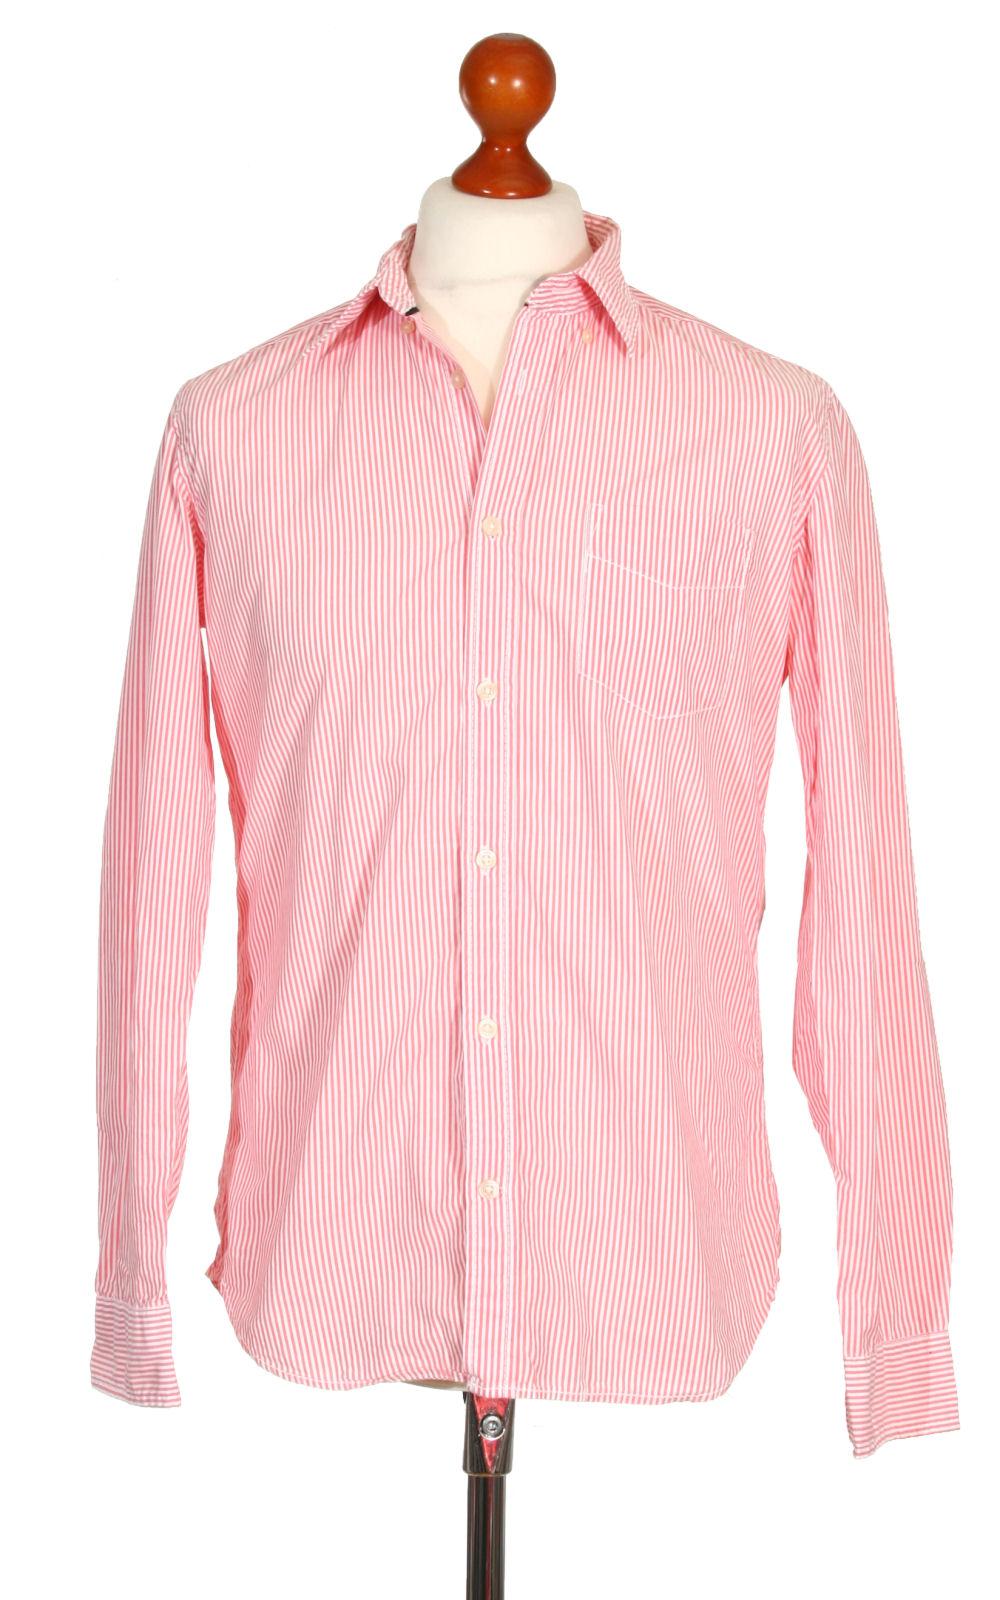 91c8a7a4ab Férfi ruházat | Férfi Ing hosszú, H&M, Méret: S | http://www ...